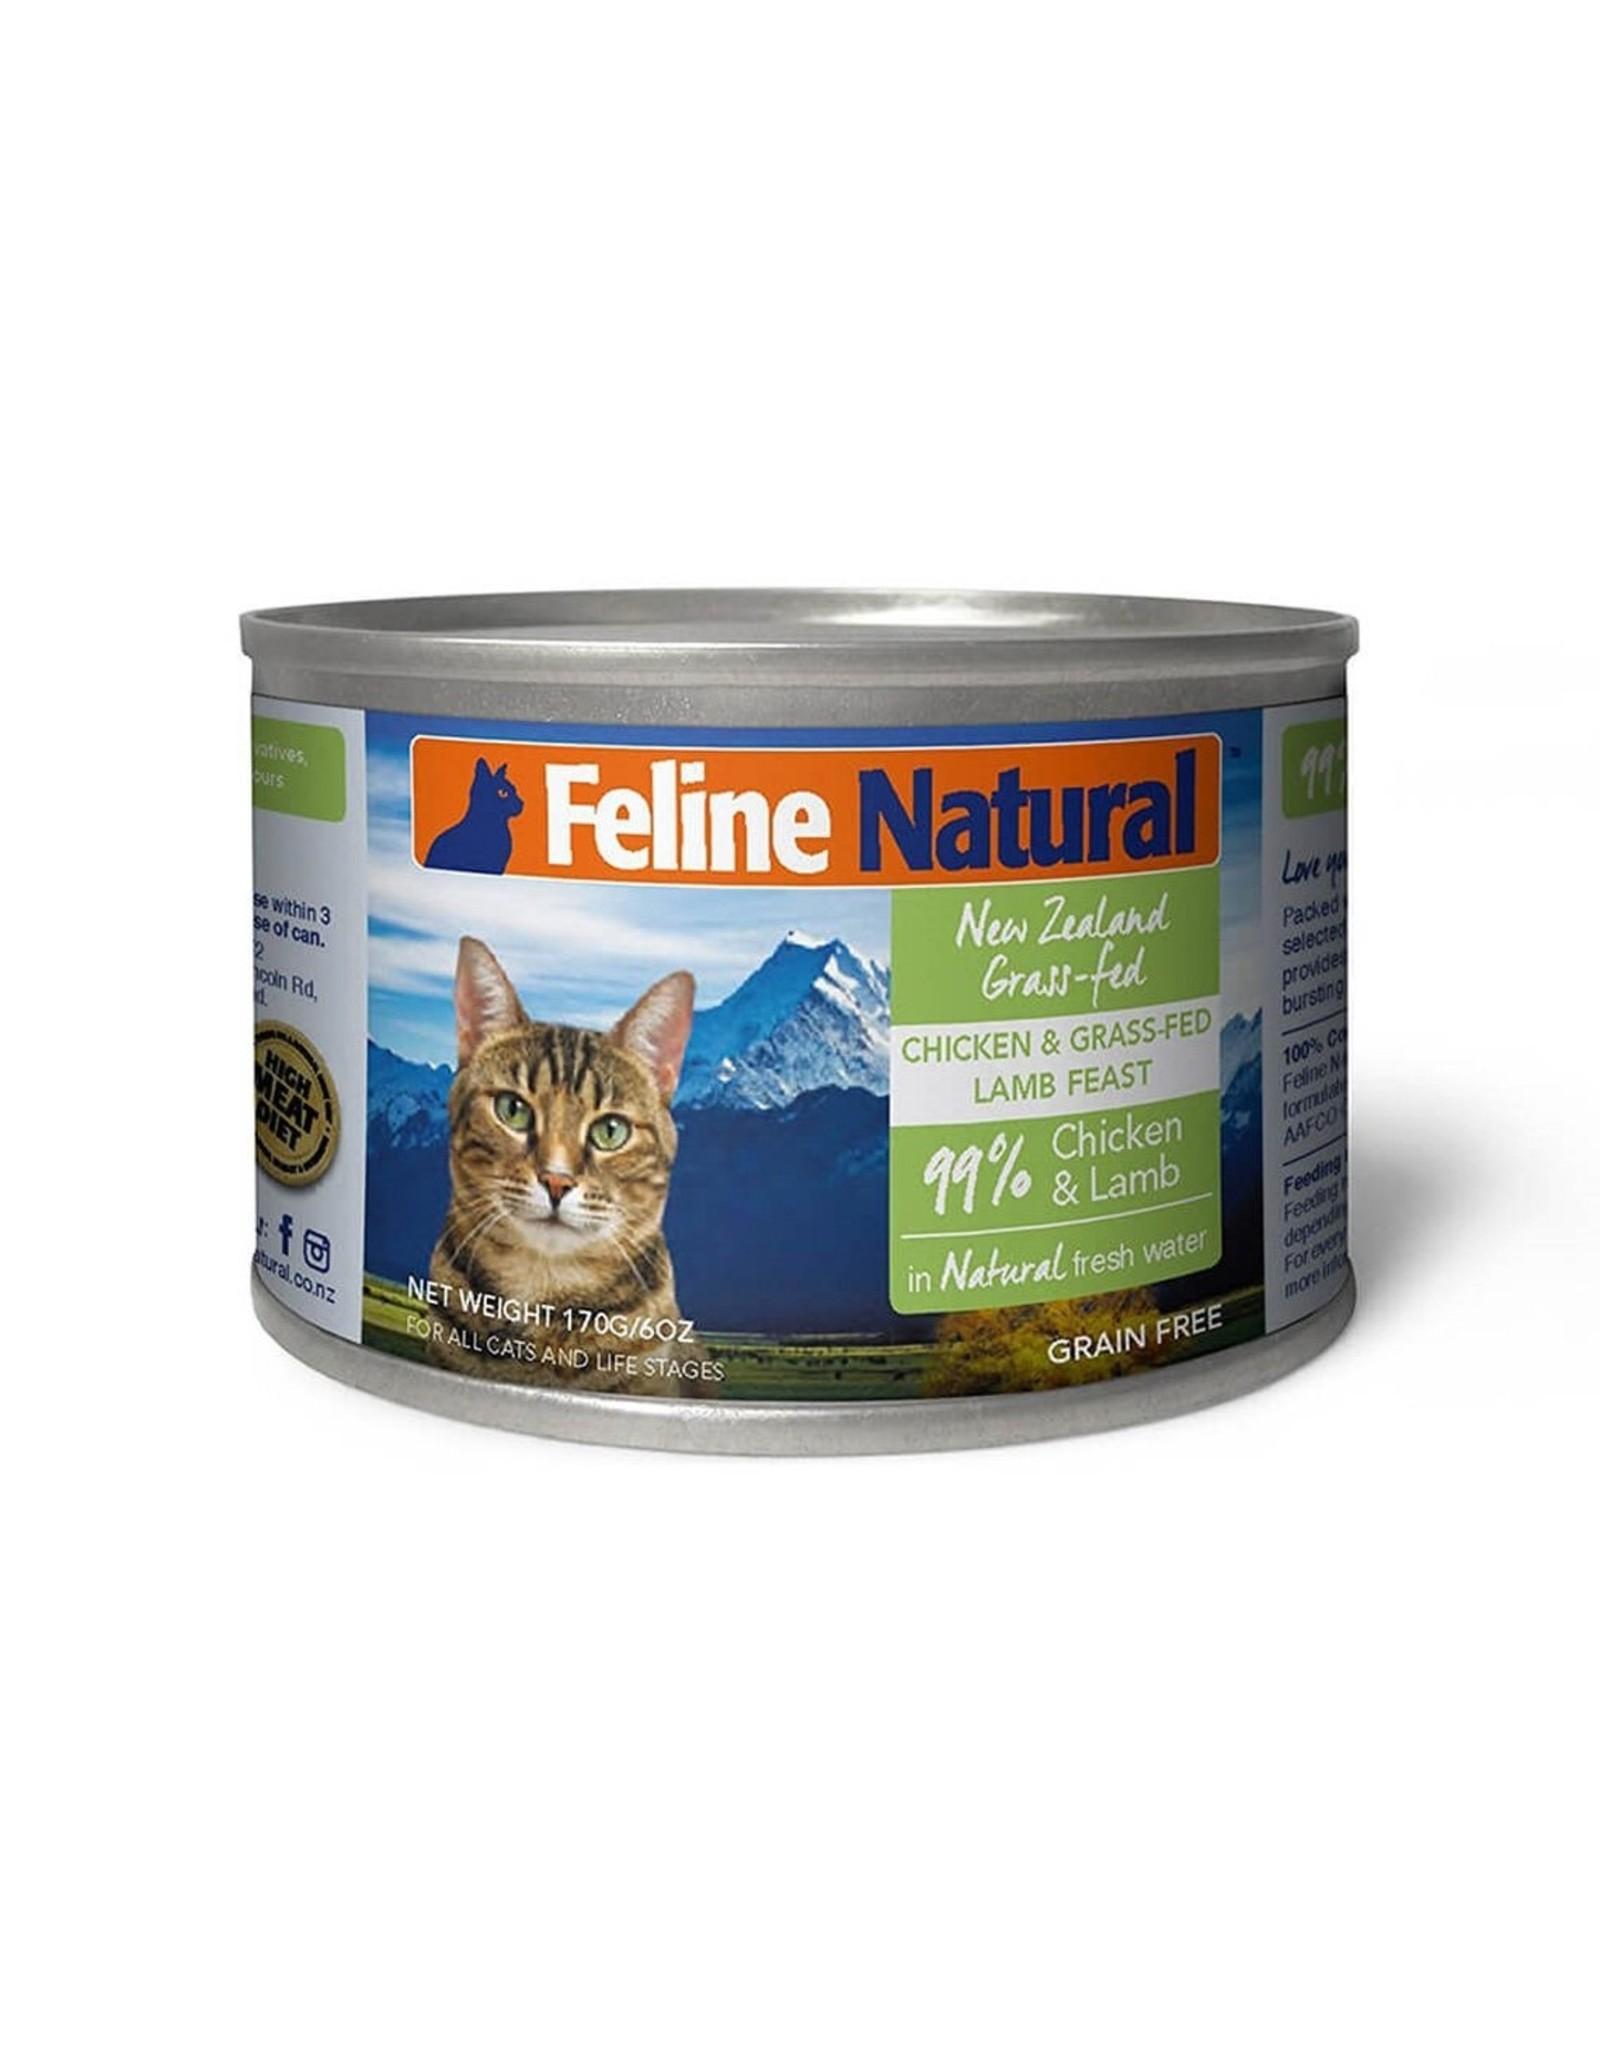 Feline Natural Feline Natural Chicken and Lamb Feast